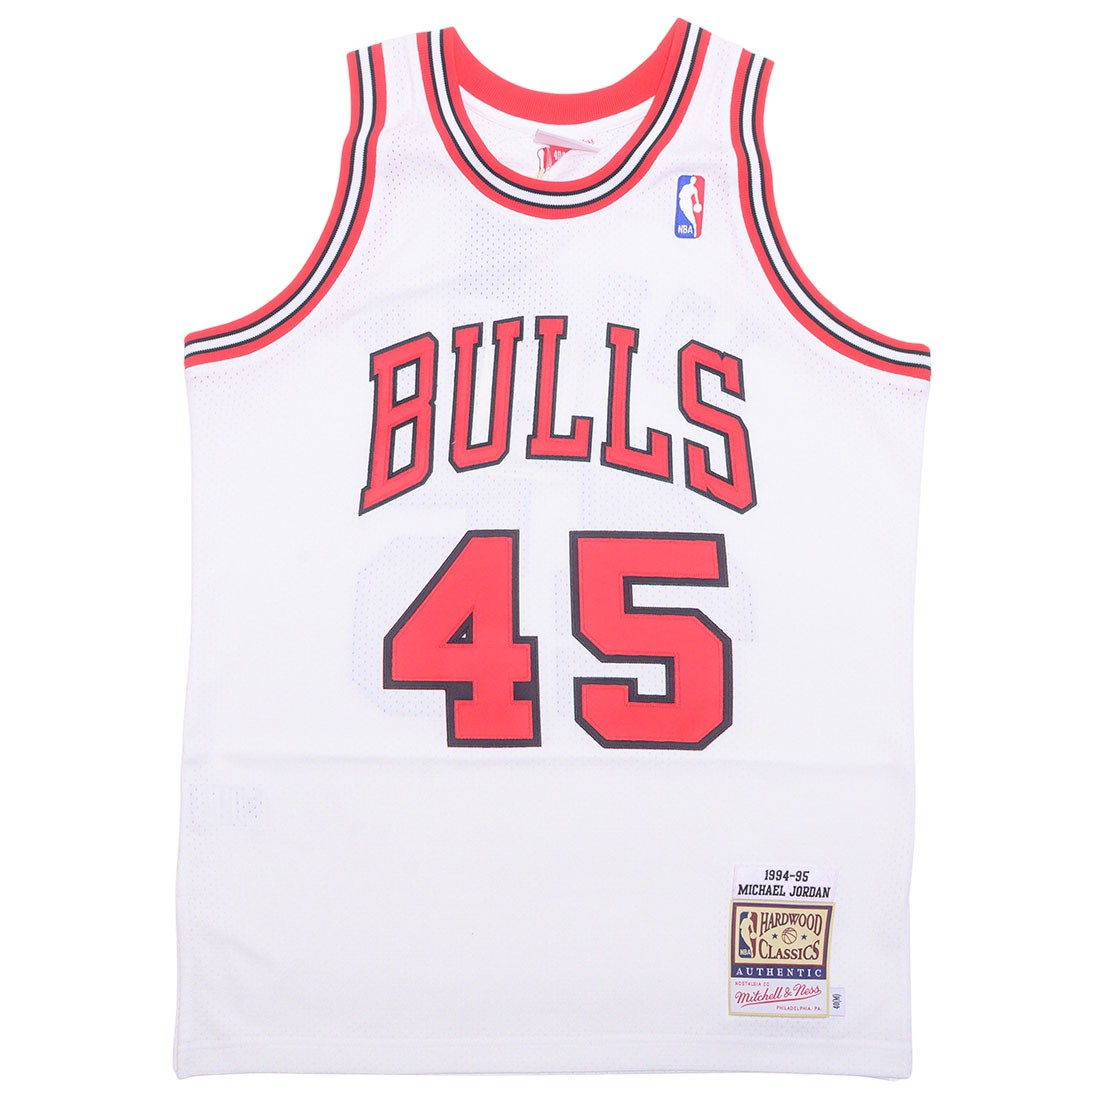 Mitchell And Ness x NBA Men Chicago Bulls Michael Jordan Jersey - White 94 (white)